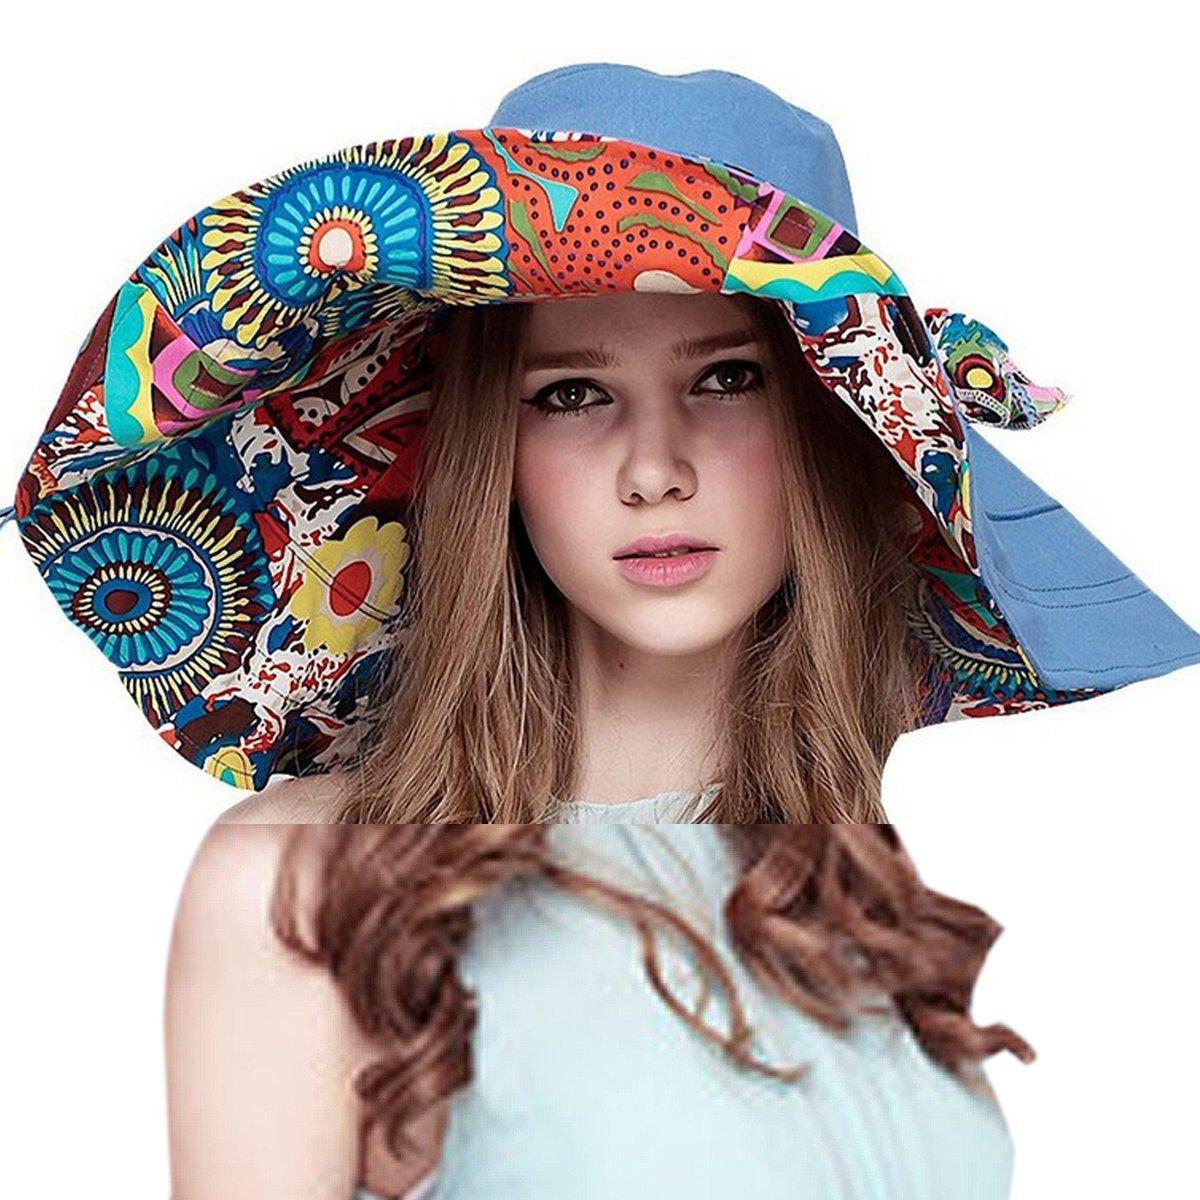 HAPEE Large Wide Brim Sun Hat Womens Summer Hats for Beach Garding,Floppy